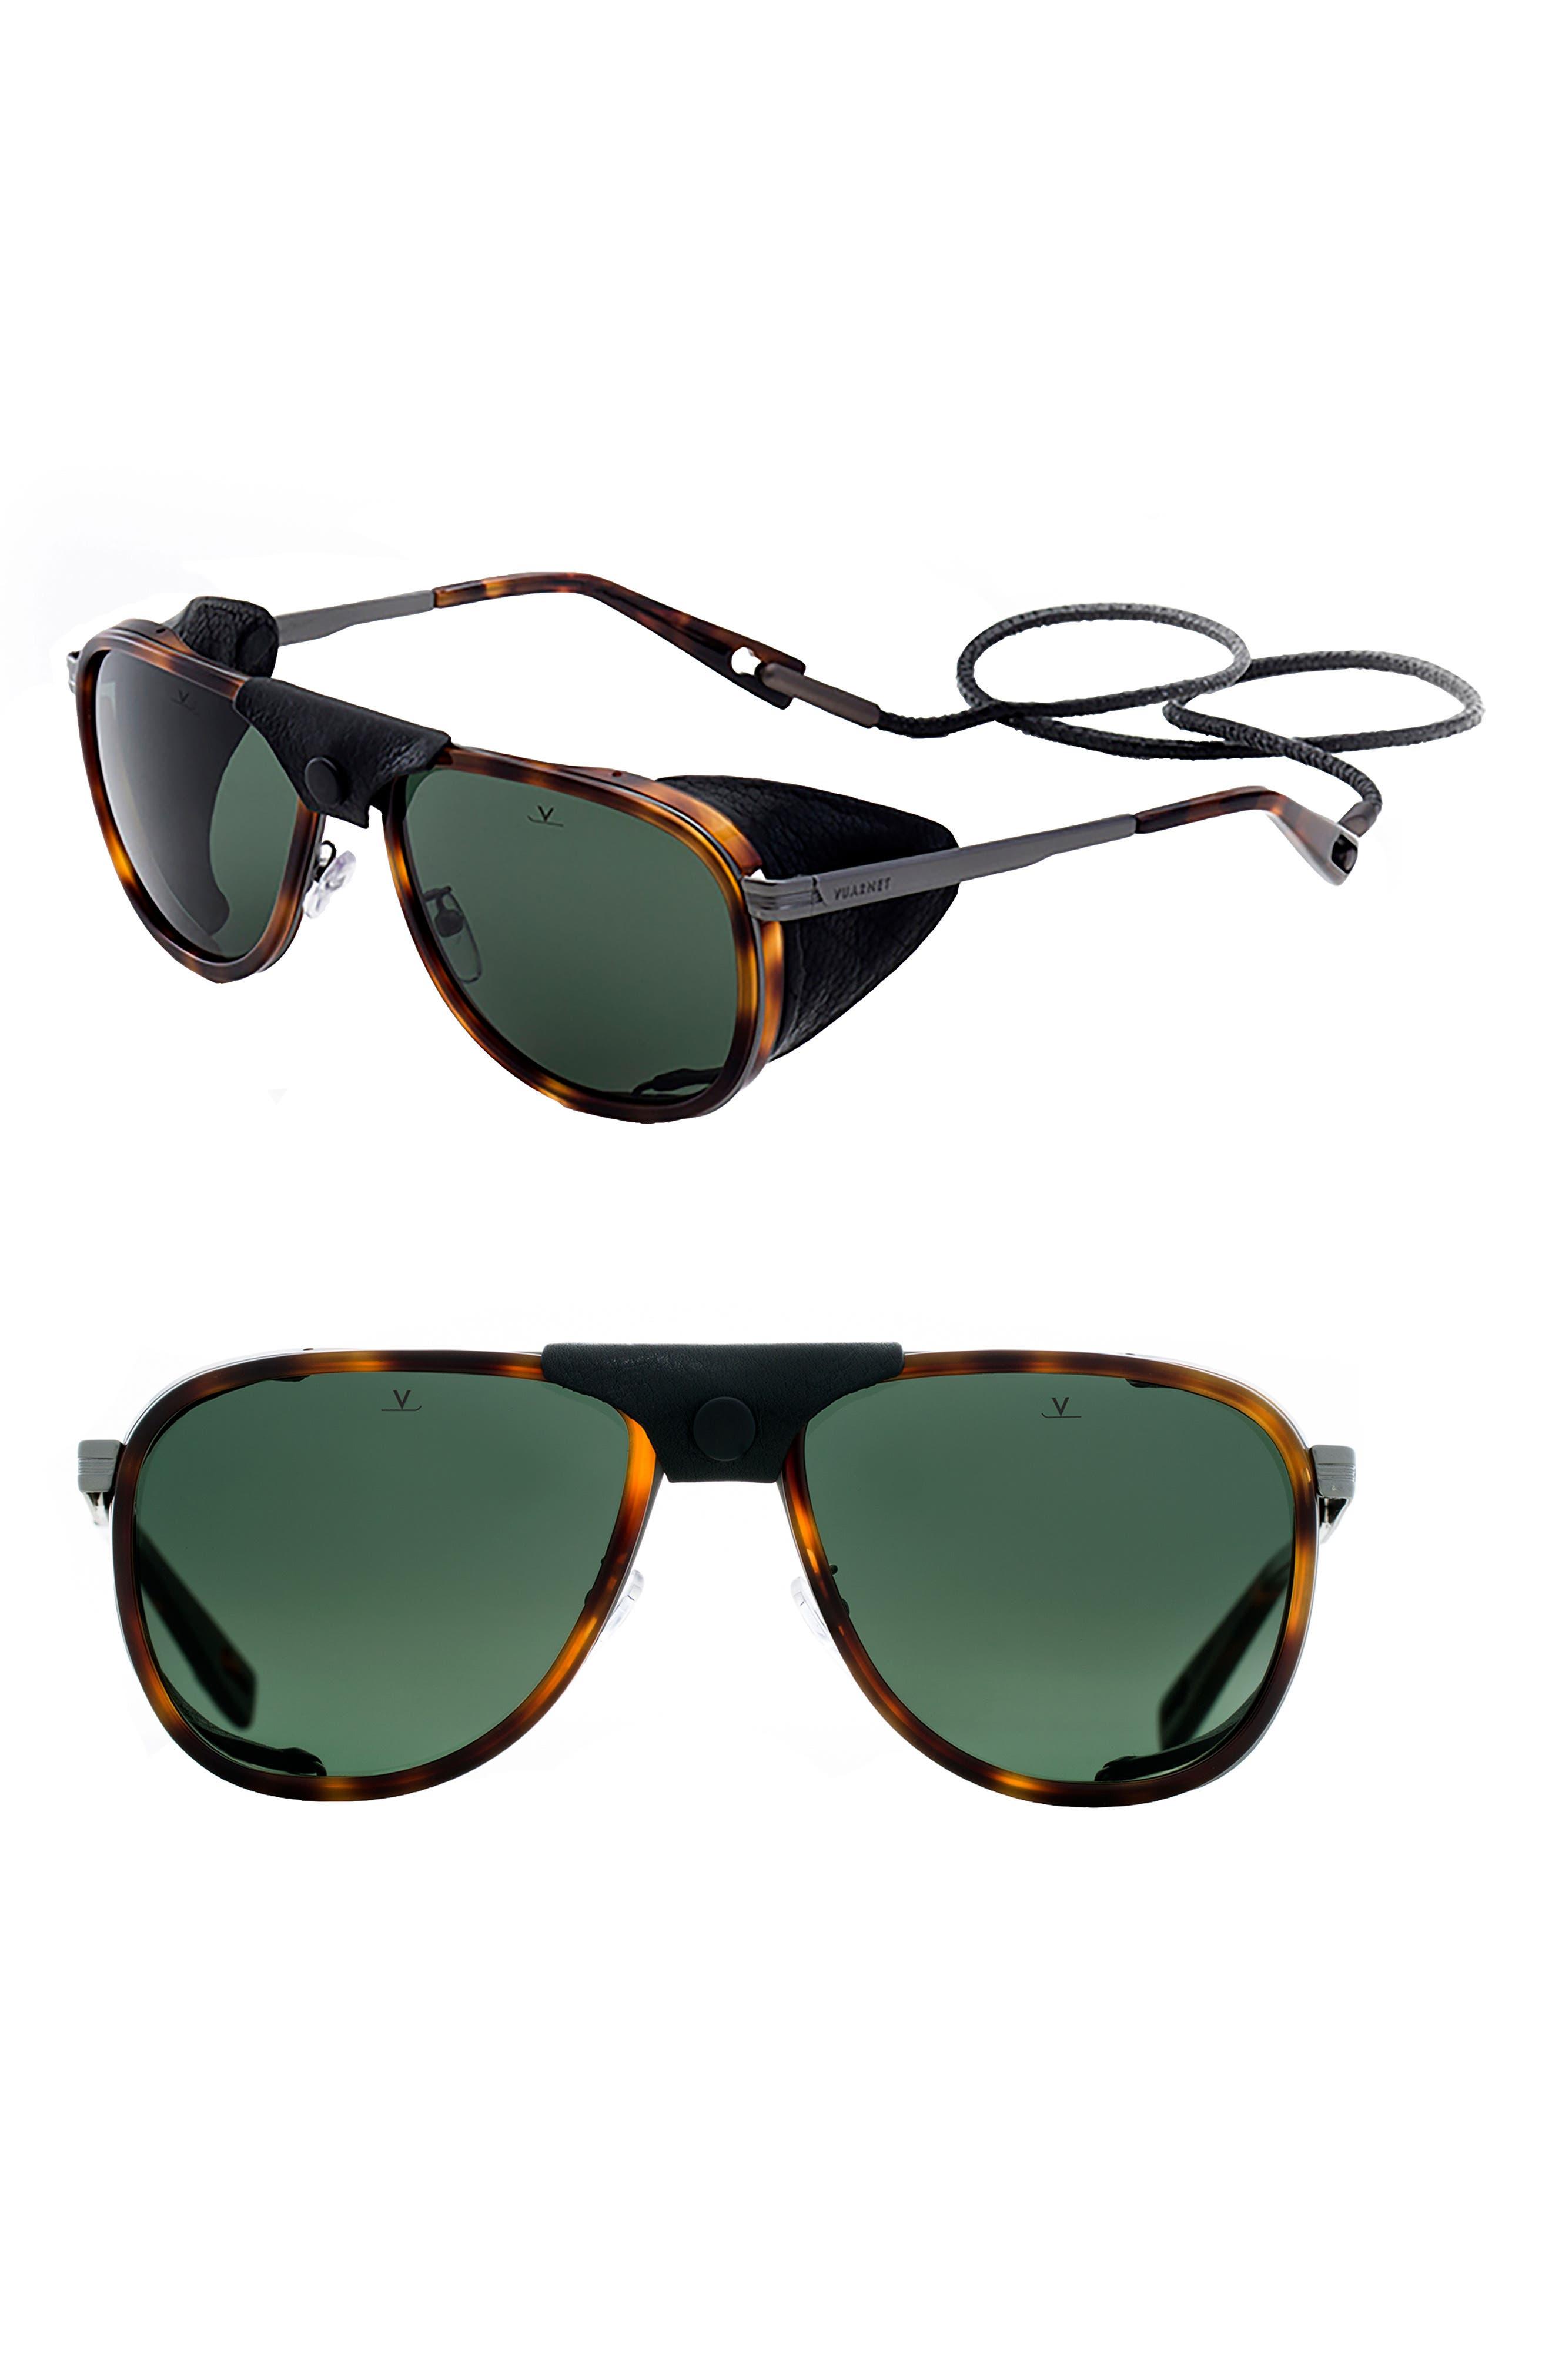 EyeglassesNordstrom Vuarnet Vuarnet Men's Sunglassesamp; Men's Sunglassesamp; EyeglassesNordstrom eEW9D2HIY